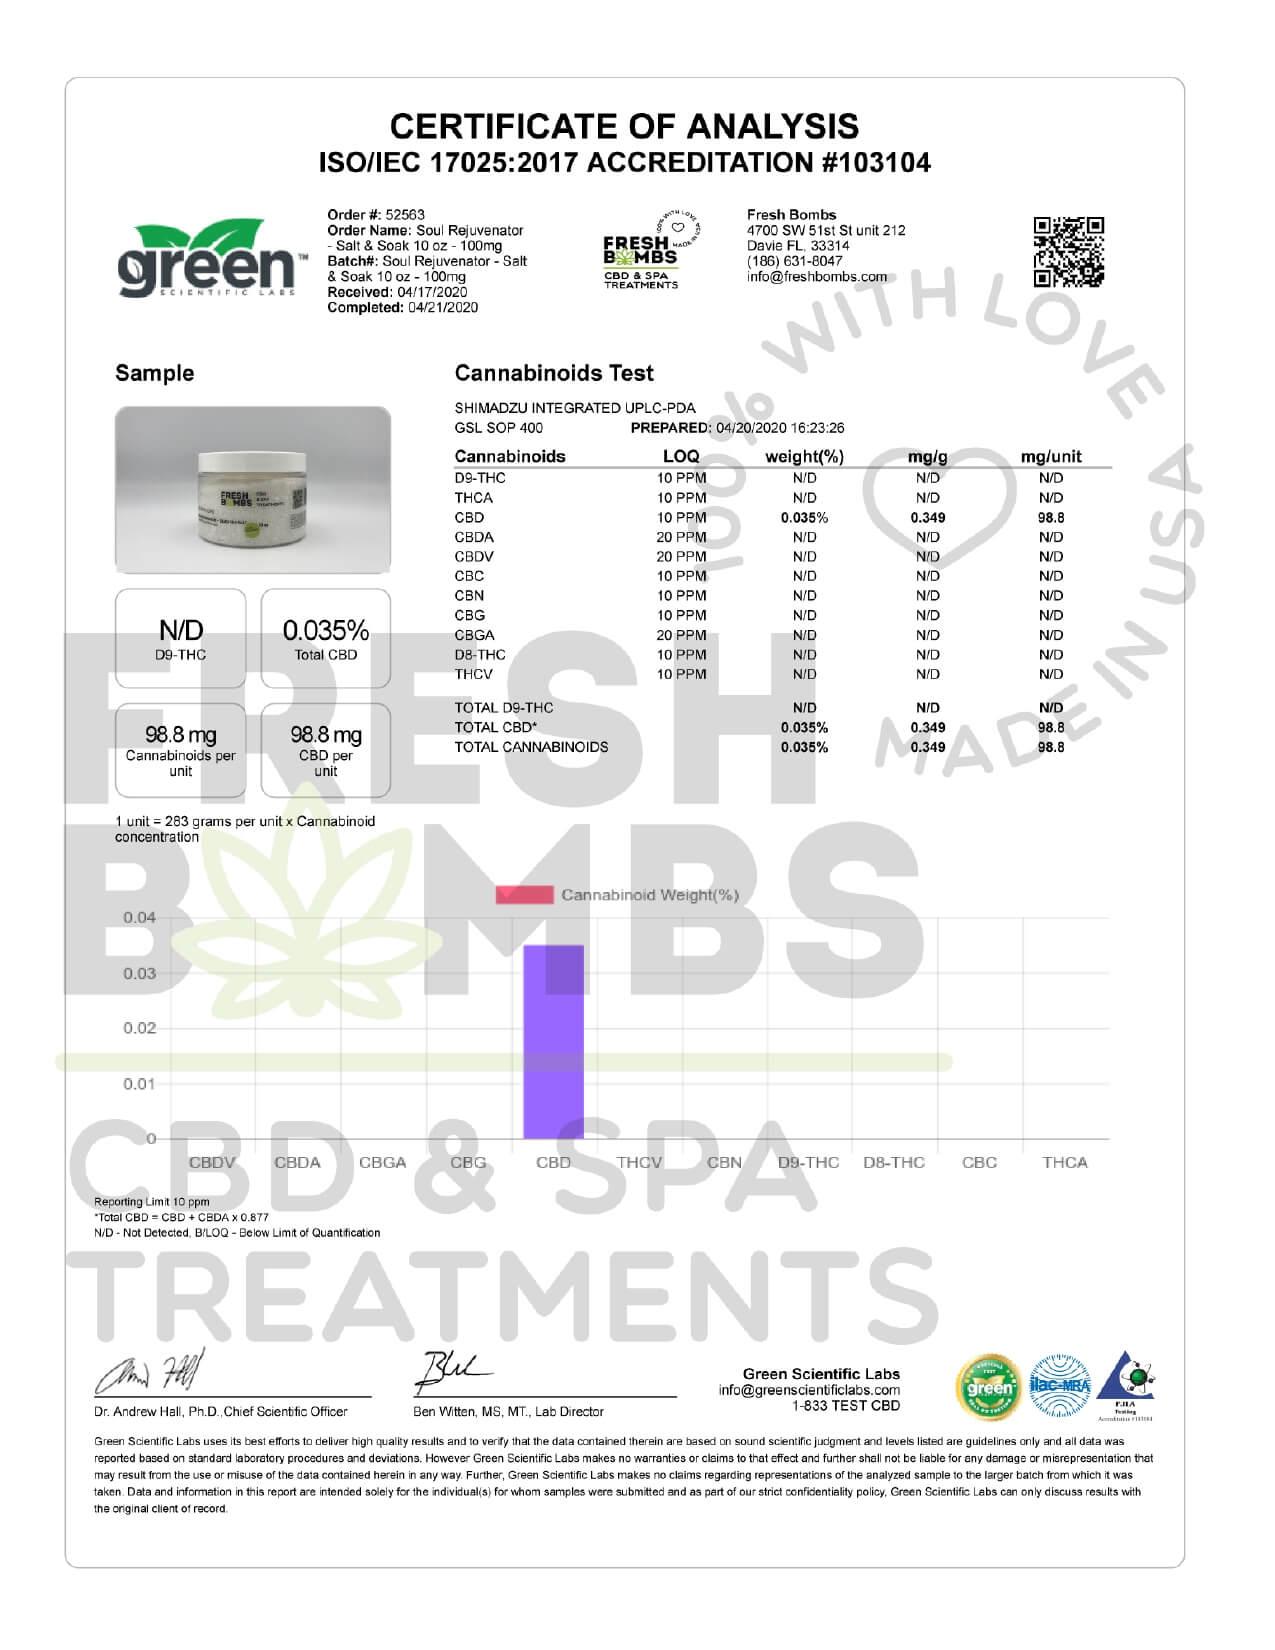 Fresh Bombs CBD Bath Soul Rejuvenator Salt Soak 100mg Lab Report